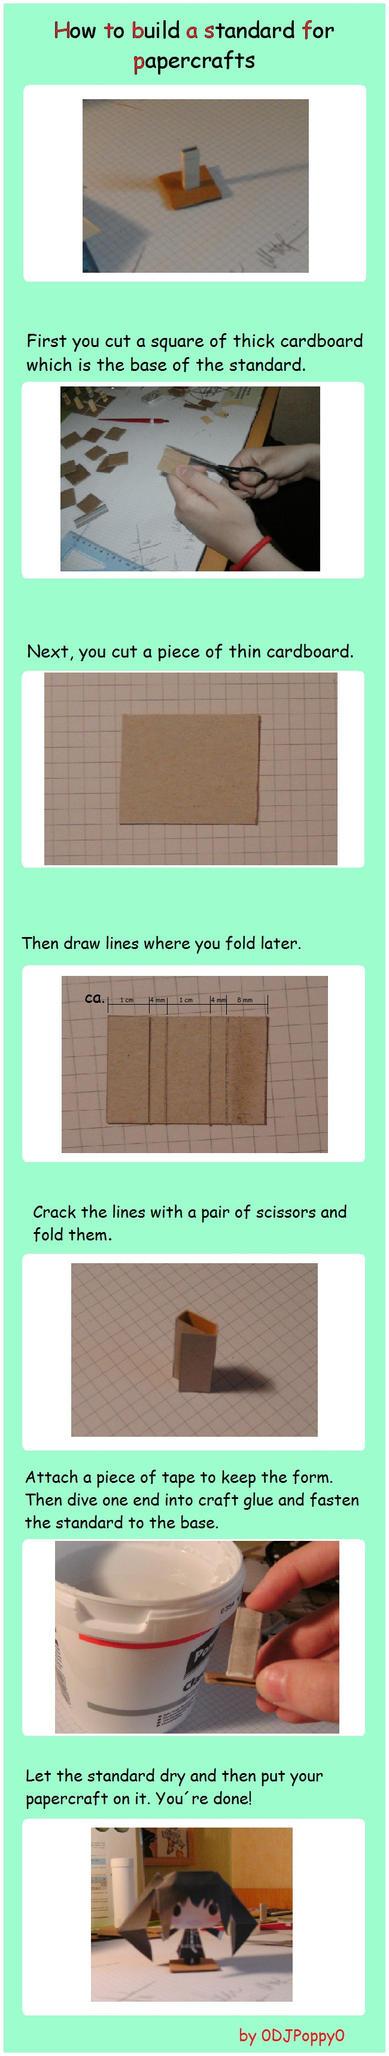 Papercraft Standard Tutorial by 0DJPoppy0